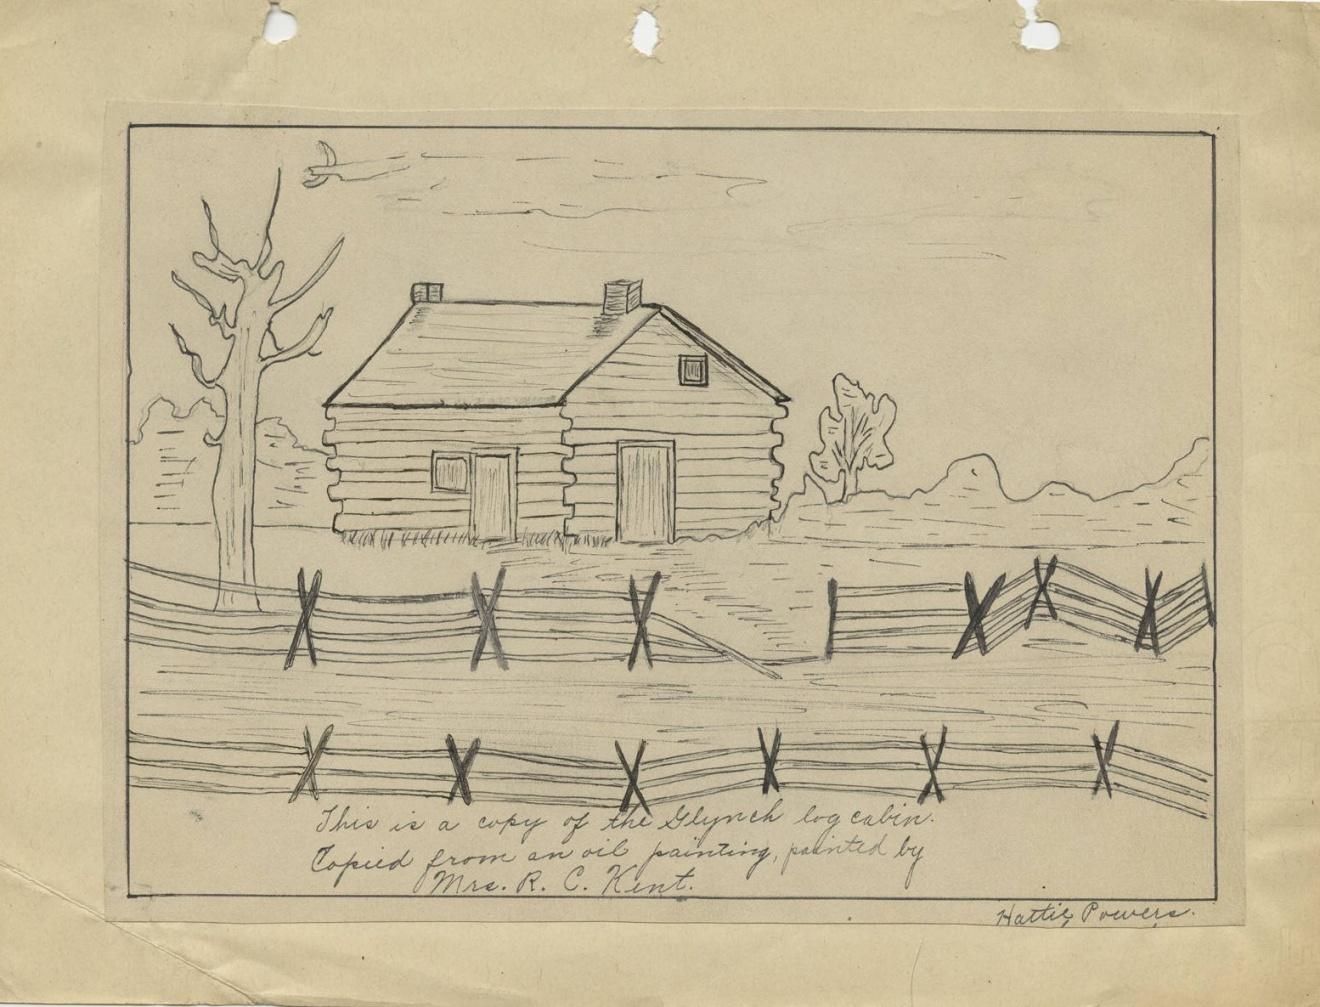 C:\Users\Vern\Documents\Fort Hill\1918 Schools Centennial\1918 Wauconda Twp Wauconda School\1918_School_Histories__Wauconda_Township__Wauconda_School_2003046_Page_54.jpg